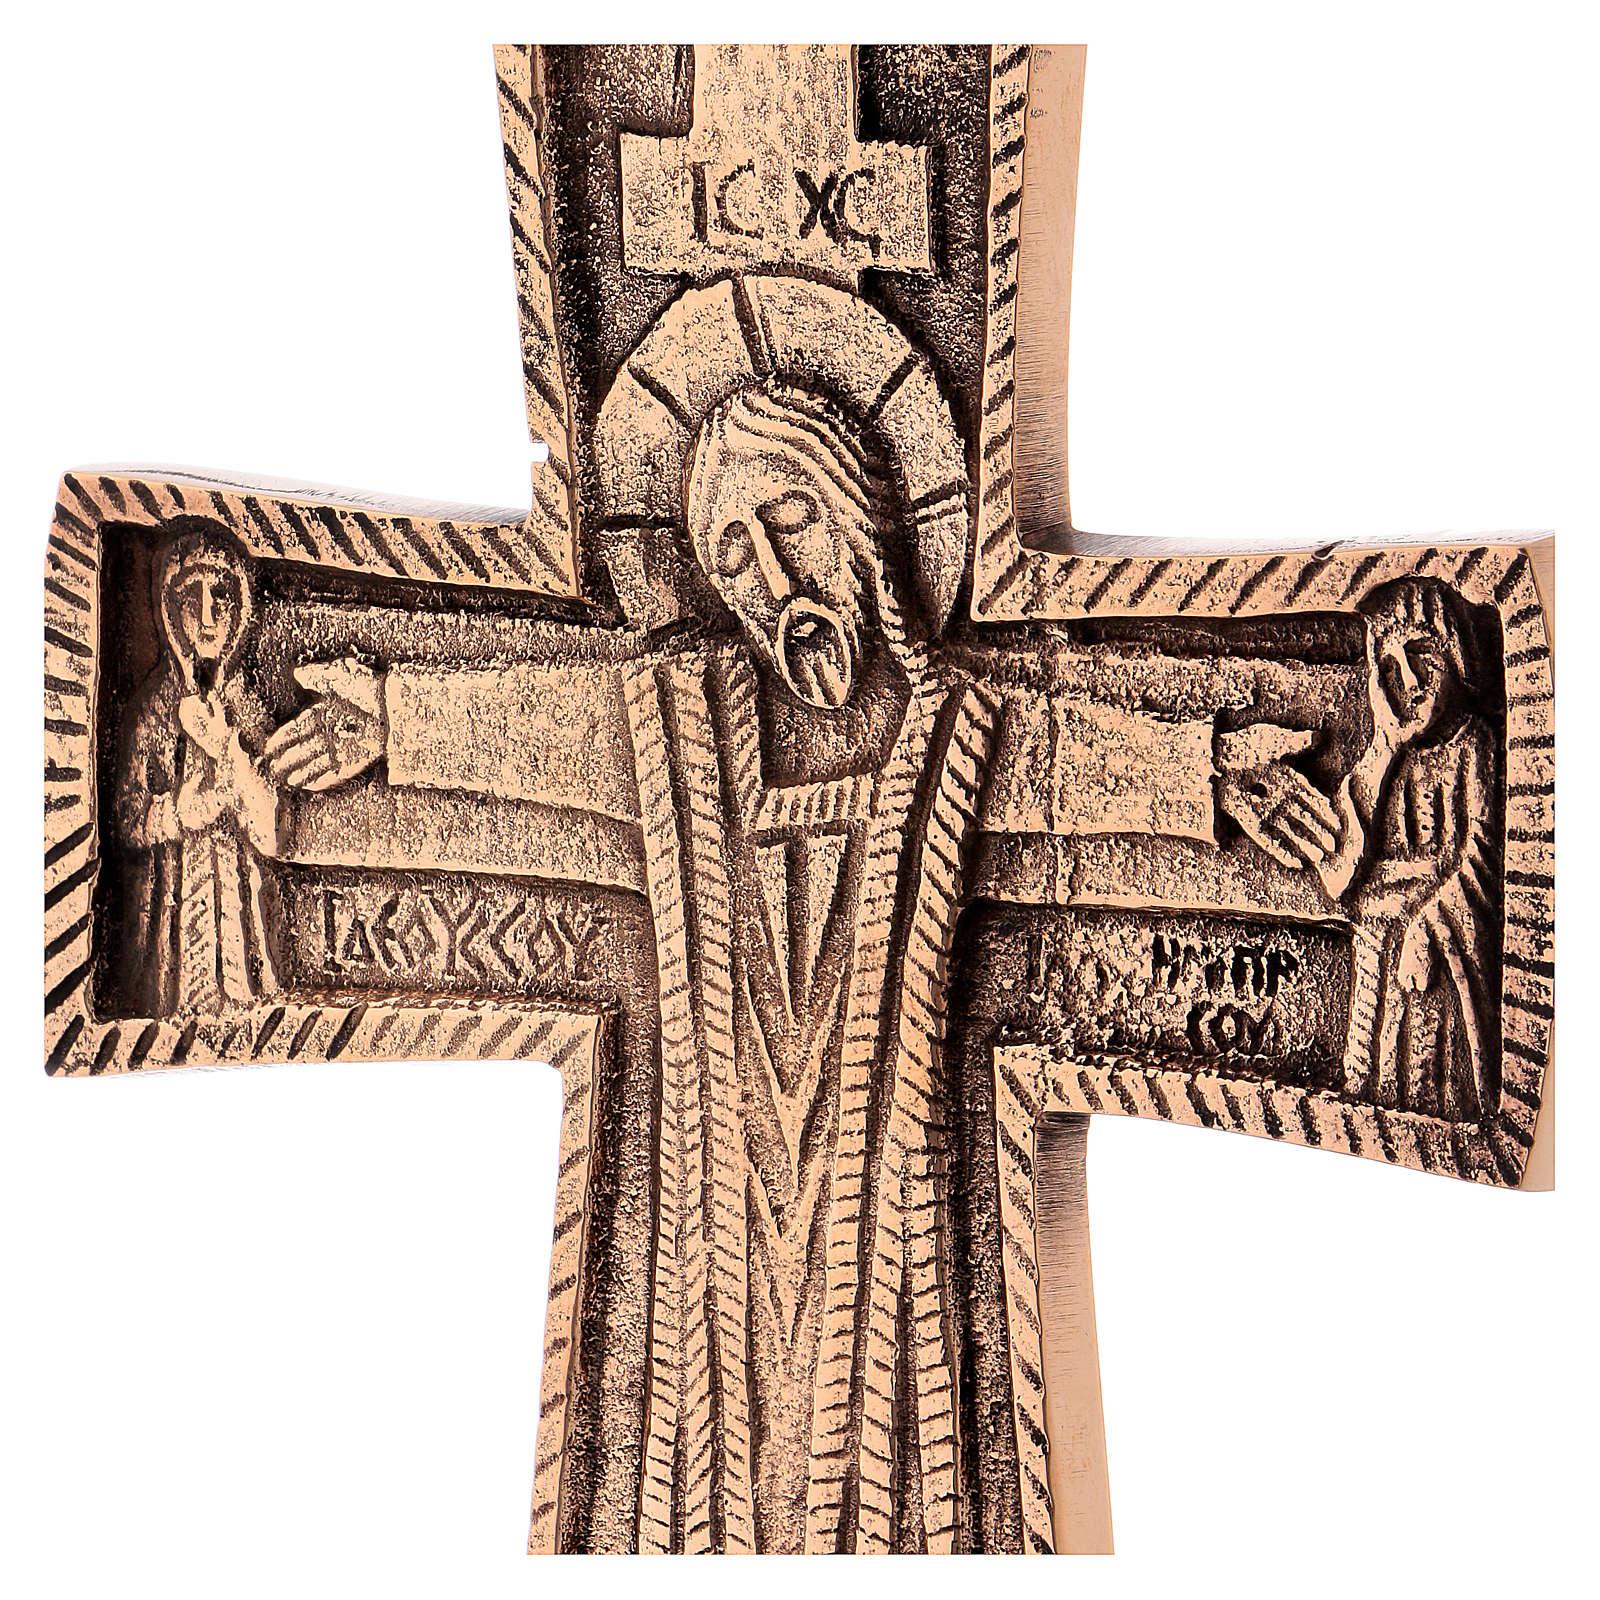 Cruz de altar Cristo Grand Pretre 28x19 cm Monjes de Belén 4